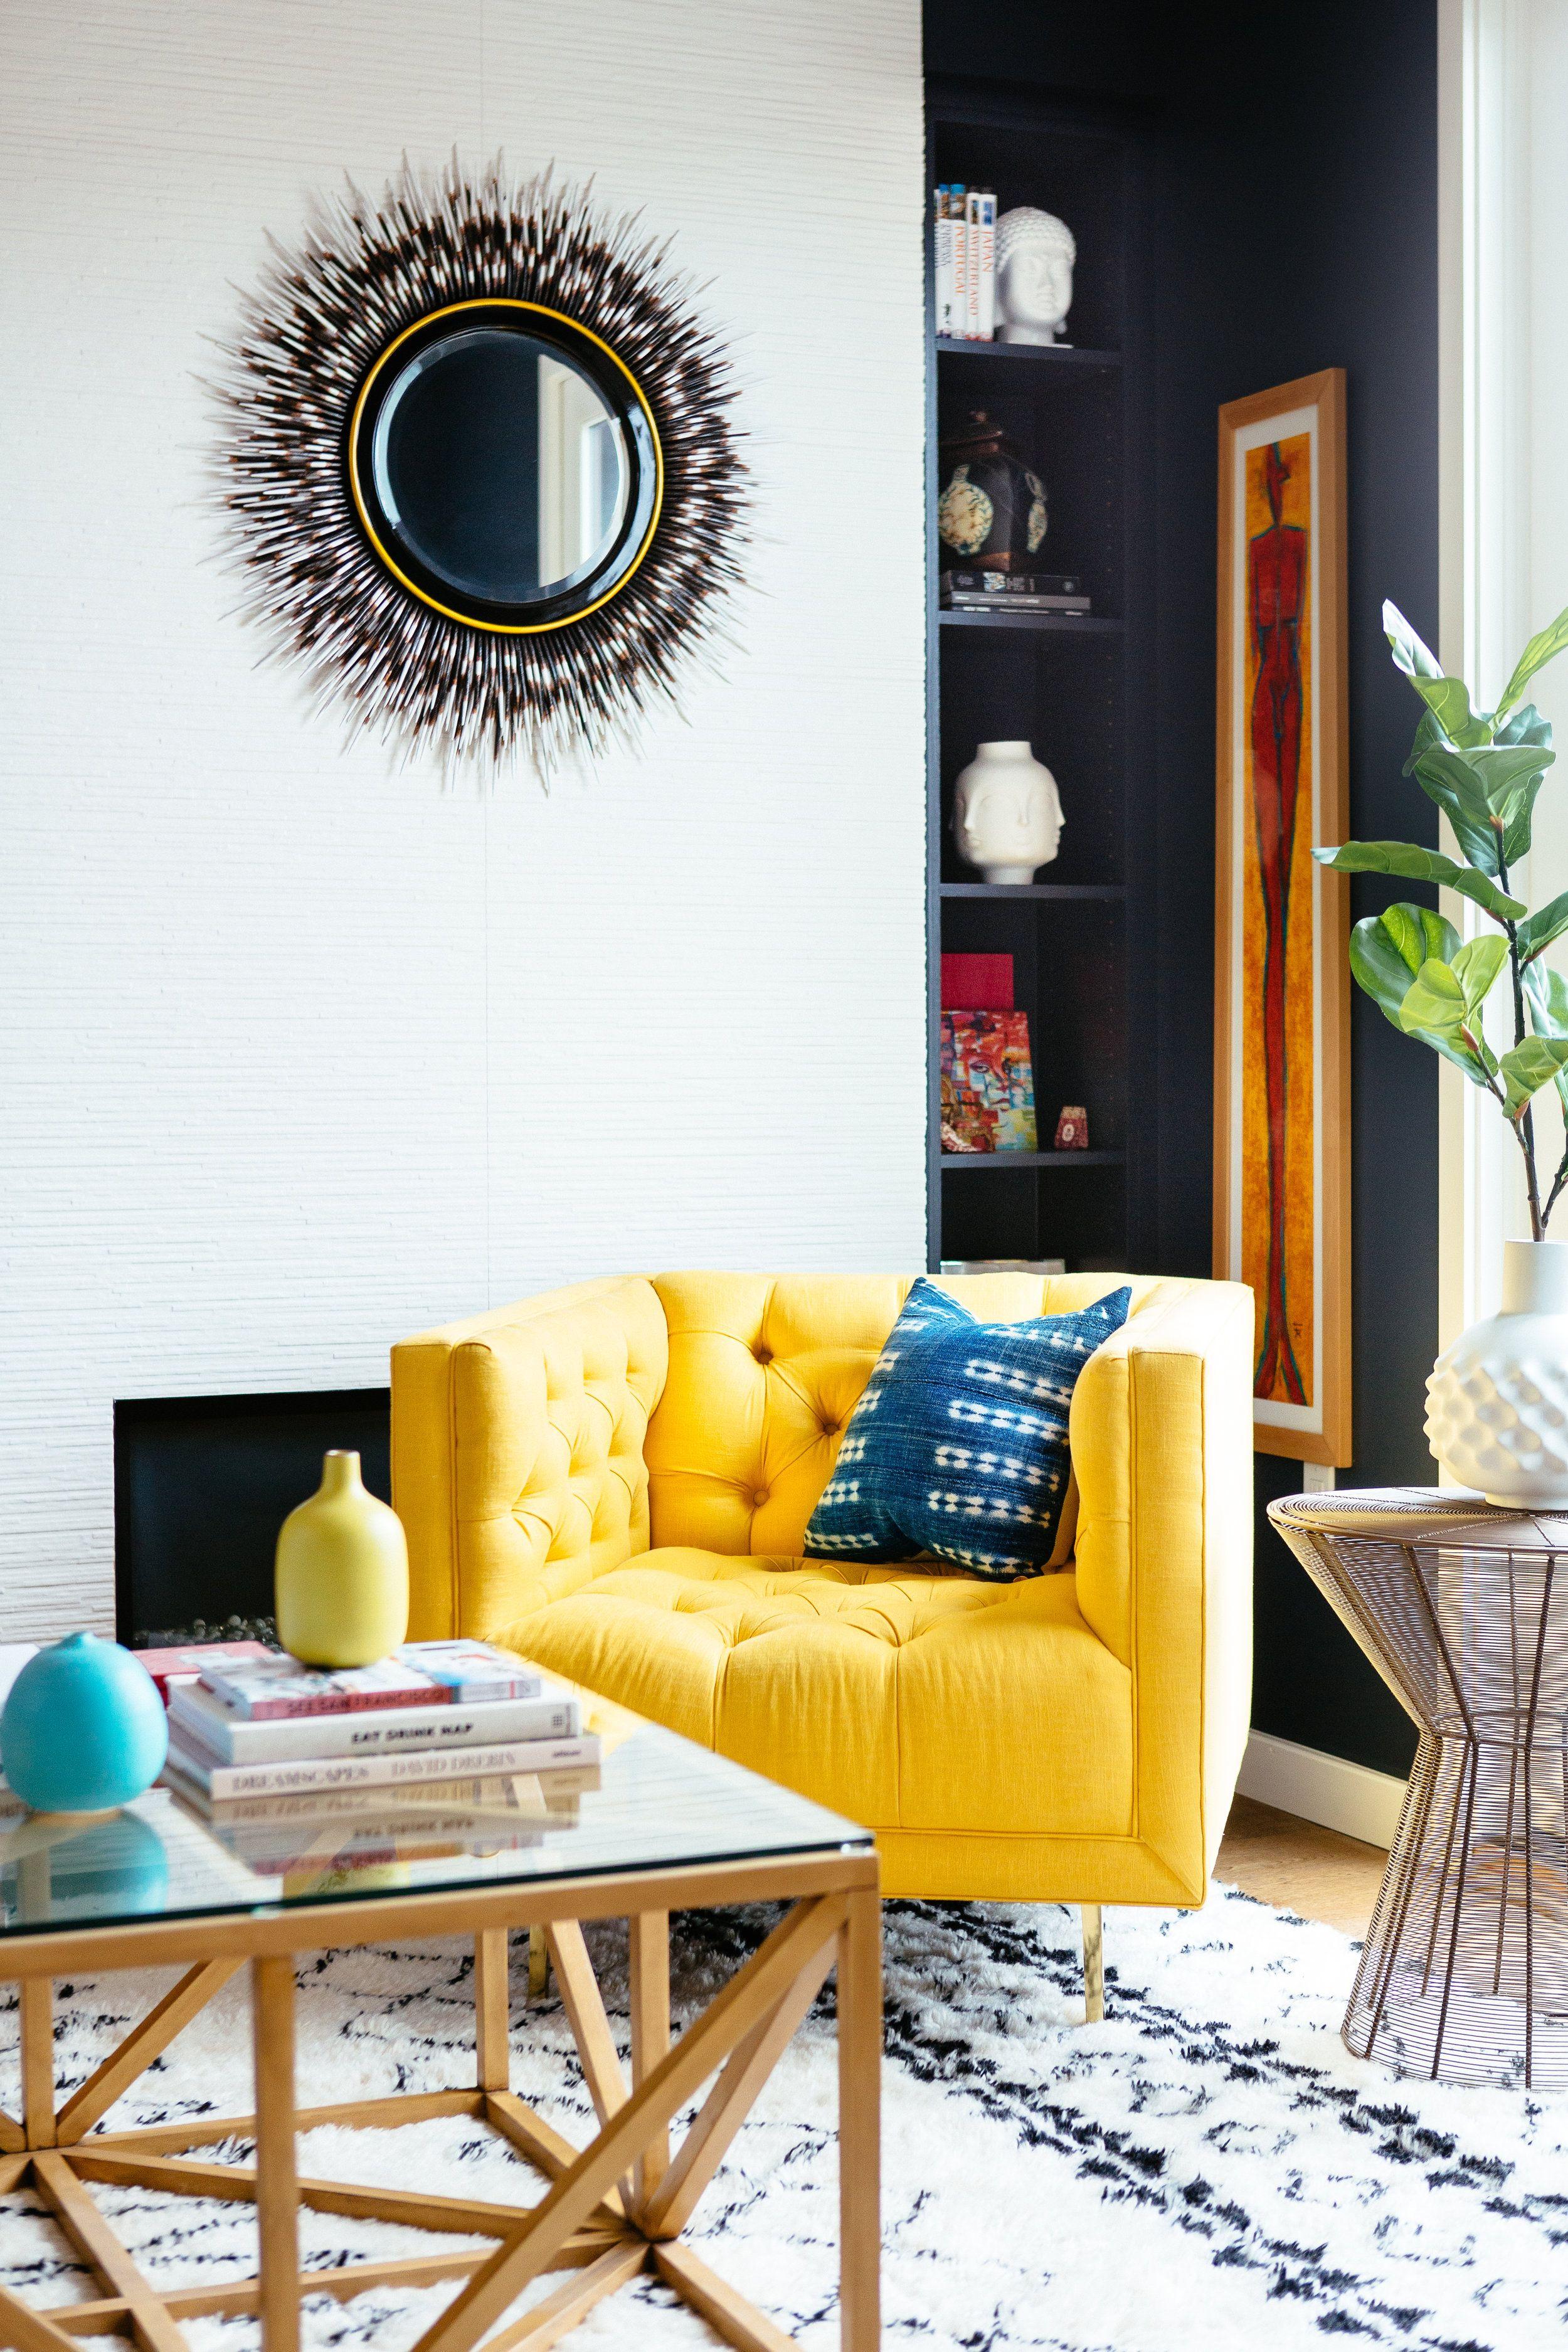 Noz Design - Dolores Park Condo - 041.jpg | Living room | Pinterest ...